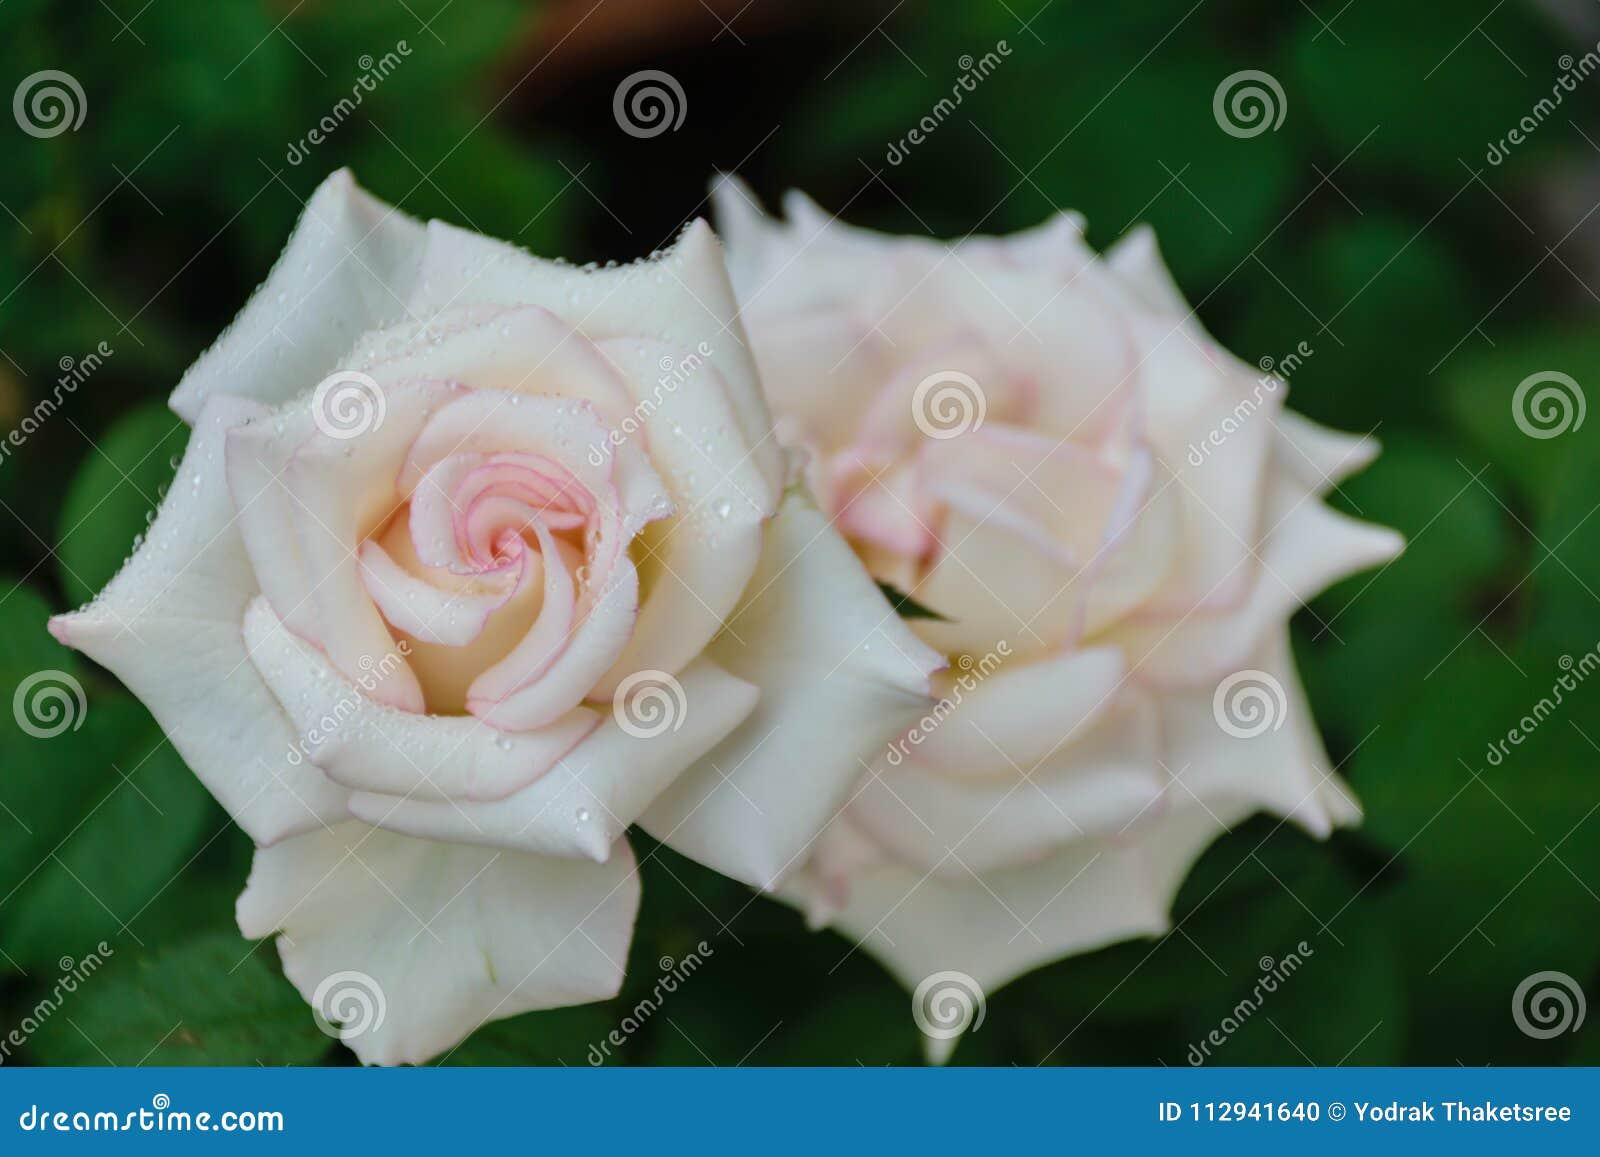 Blooming White Rose Petal Stock Photo Image Of Anniversary 112941640